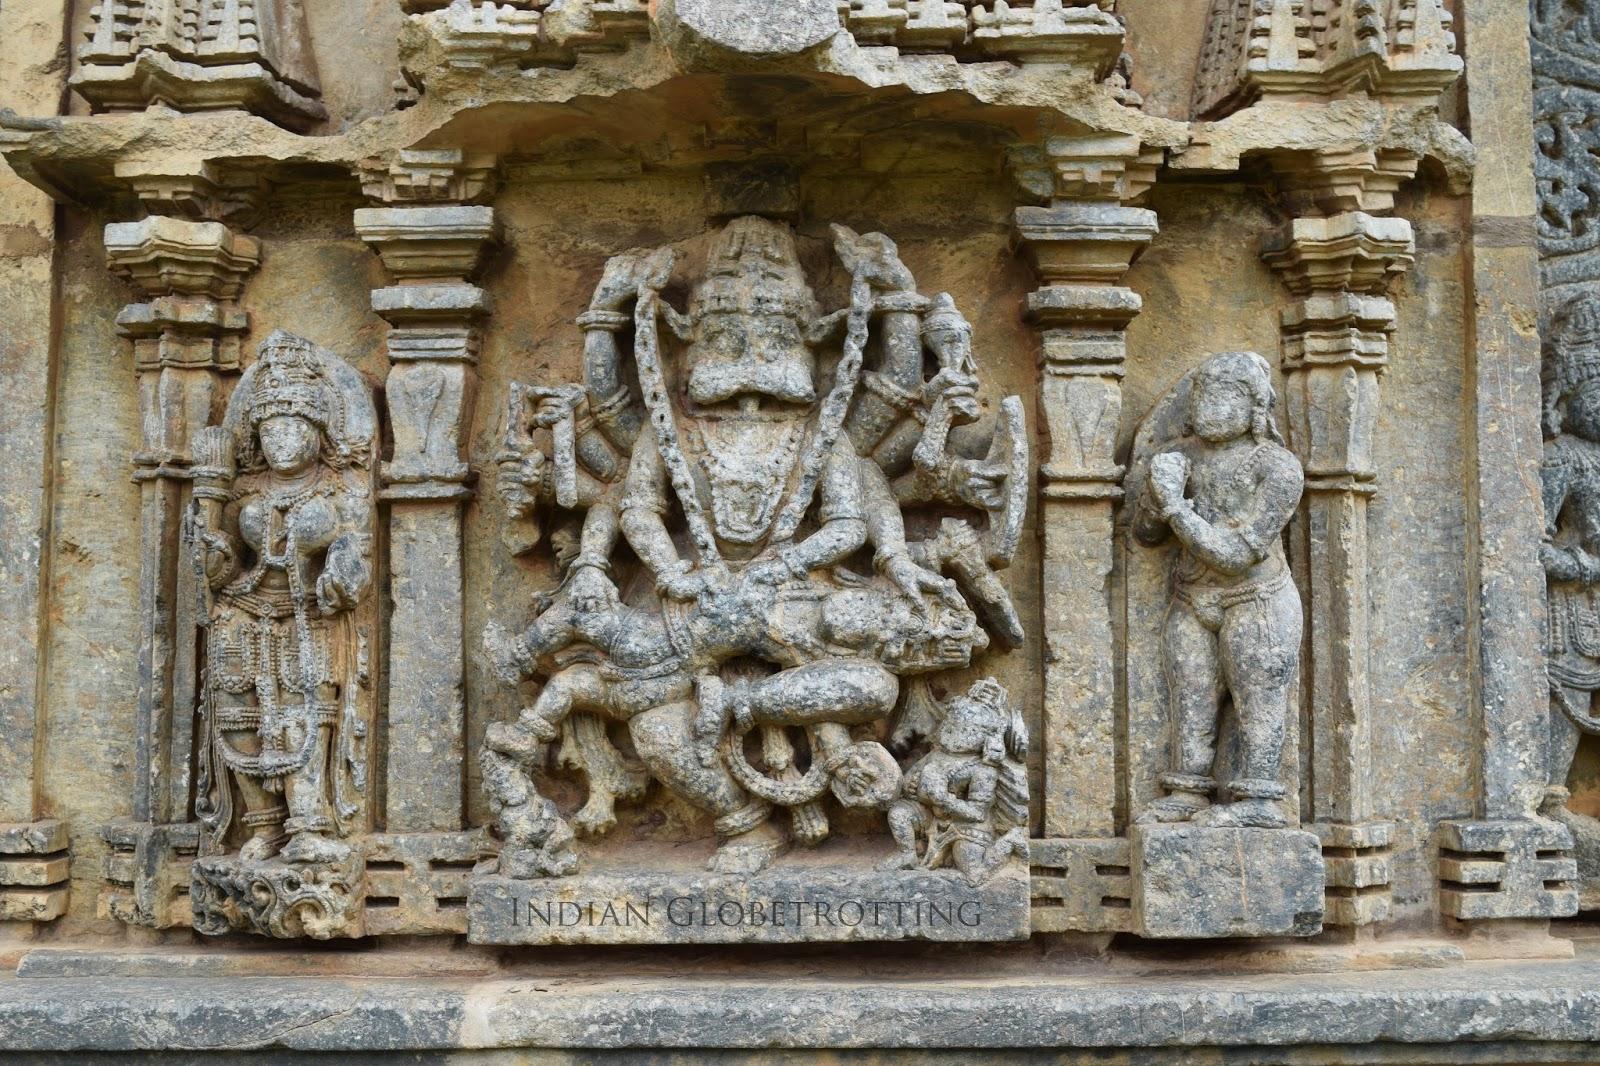 Narasimha avatar carved on the walls of the famous Hoysala Bucheswara temple in koravangala